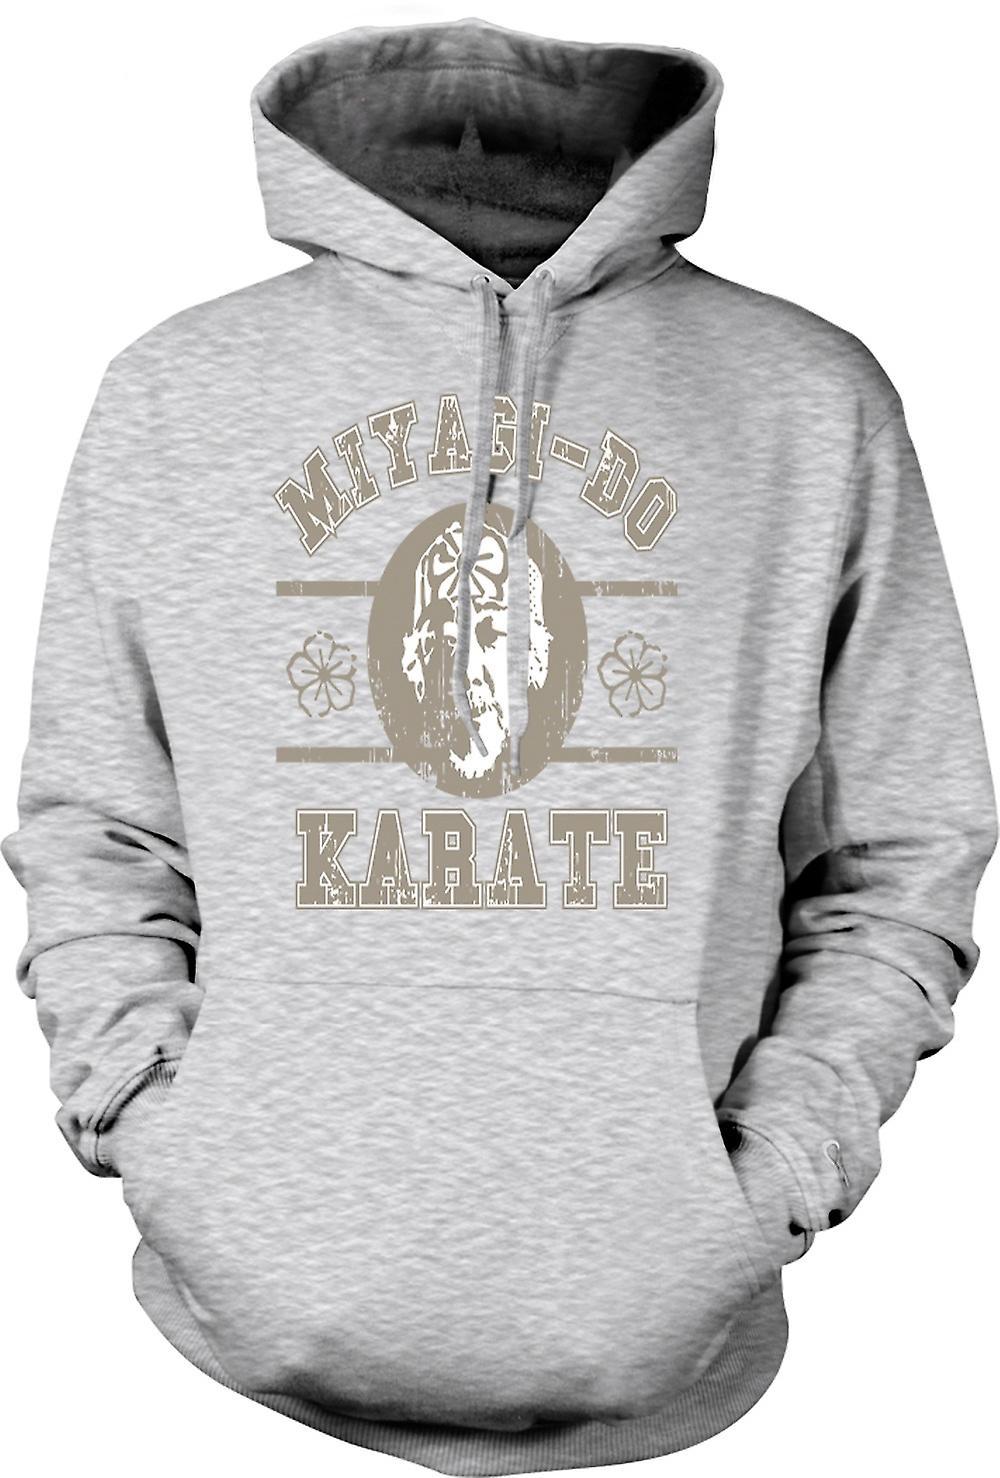 Herren Hoodie - Herr Miyagi Do - Karate Kid - Film